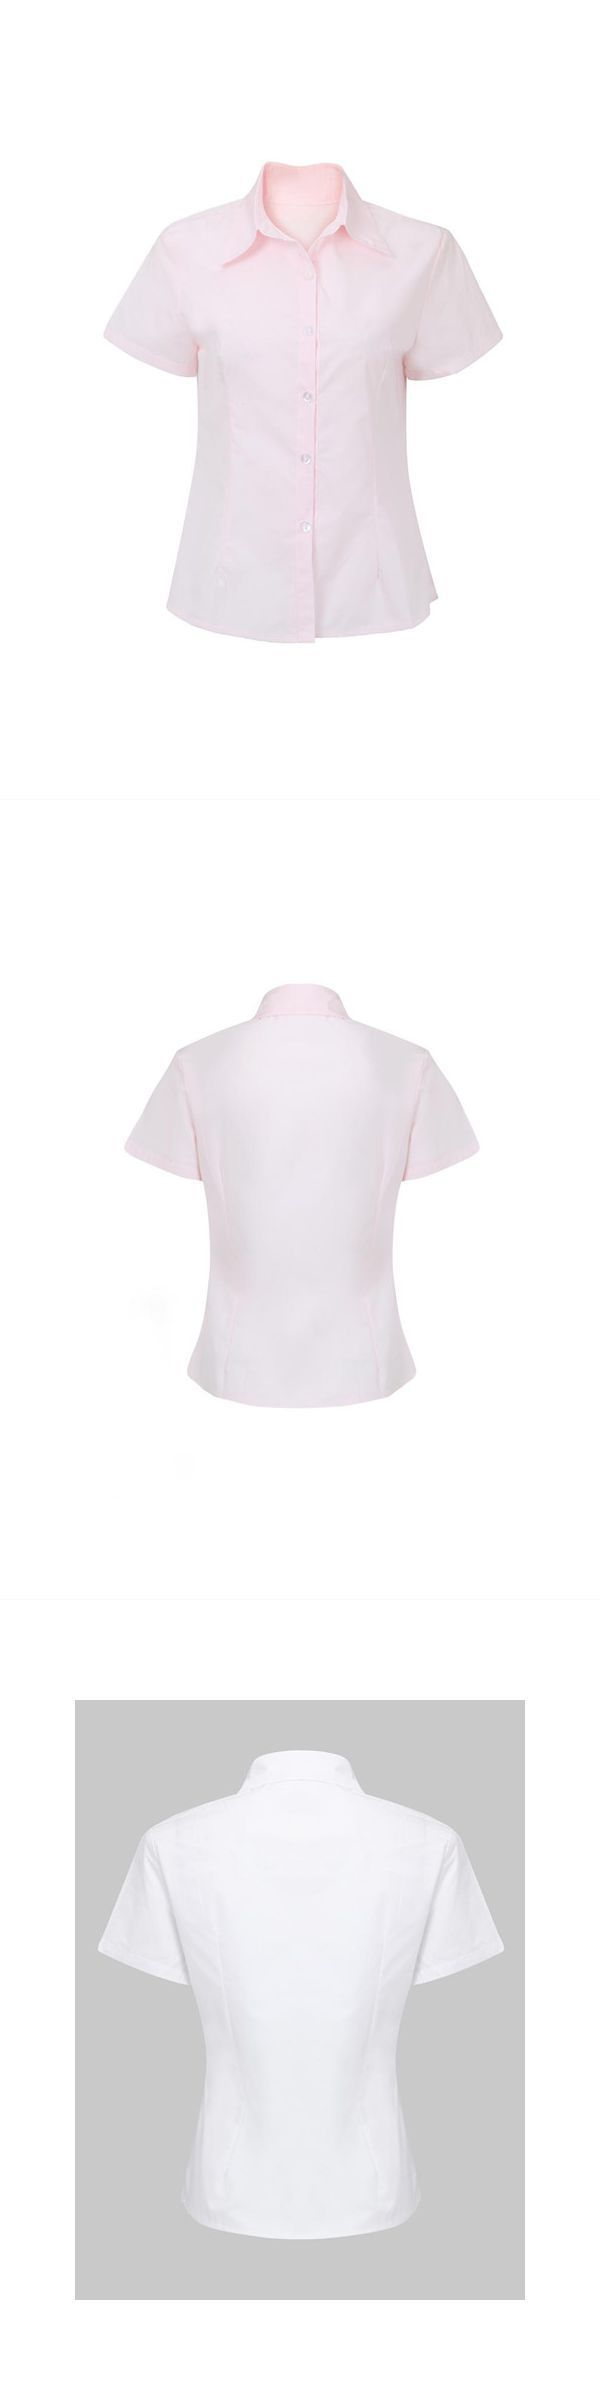 Cotton short corset professional  blouse baby girl blouses #cheap #womens #blouses #online #mexx #womens #blouses #womens #blouse #pops #open #womens #casual #blouses